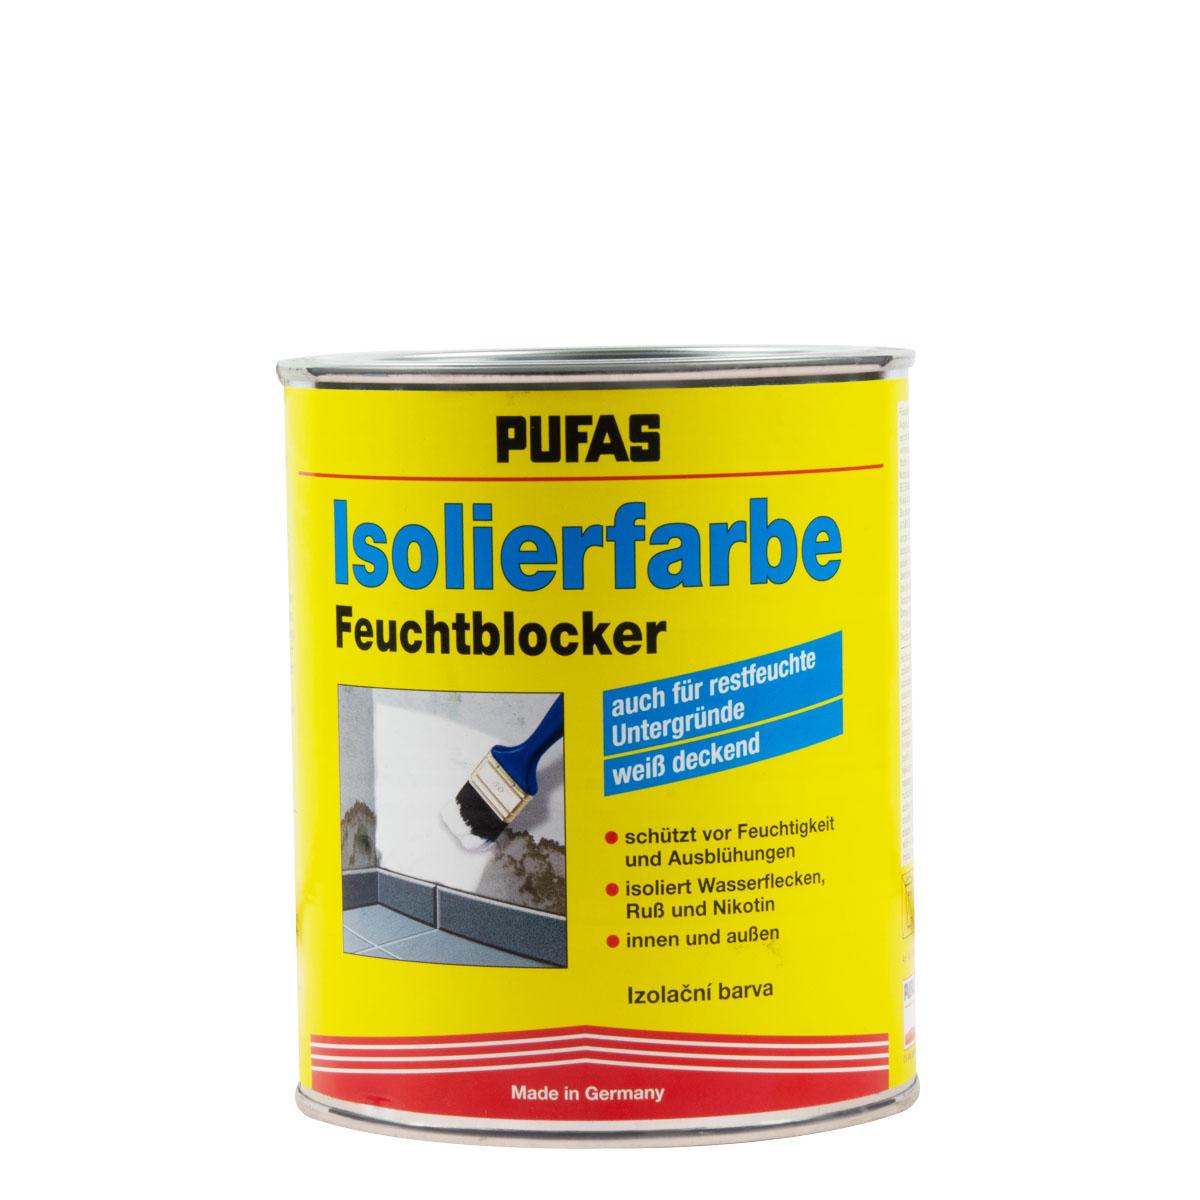 Pufas Isolierfarbe 750ml weiss, Feuchtblocker, aromatenfrei